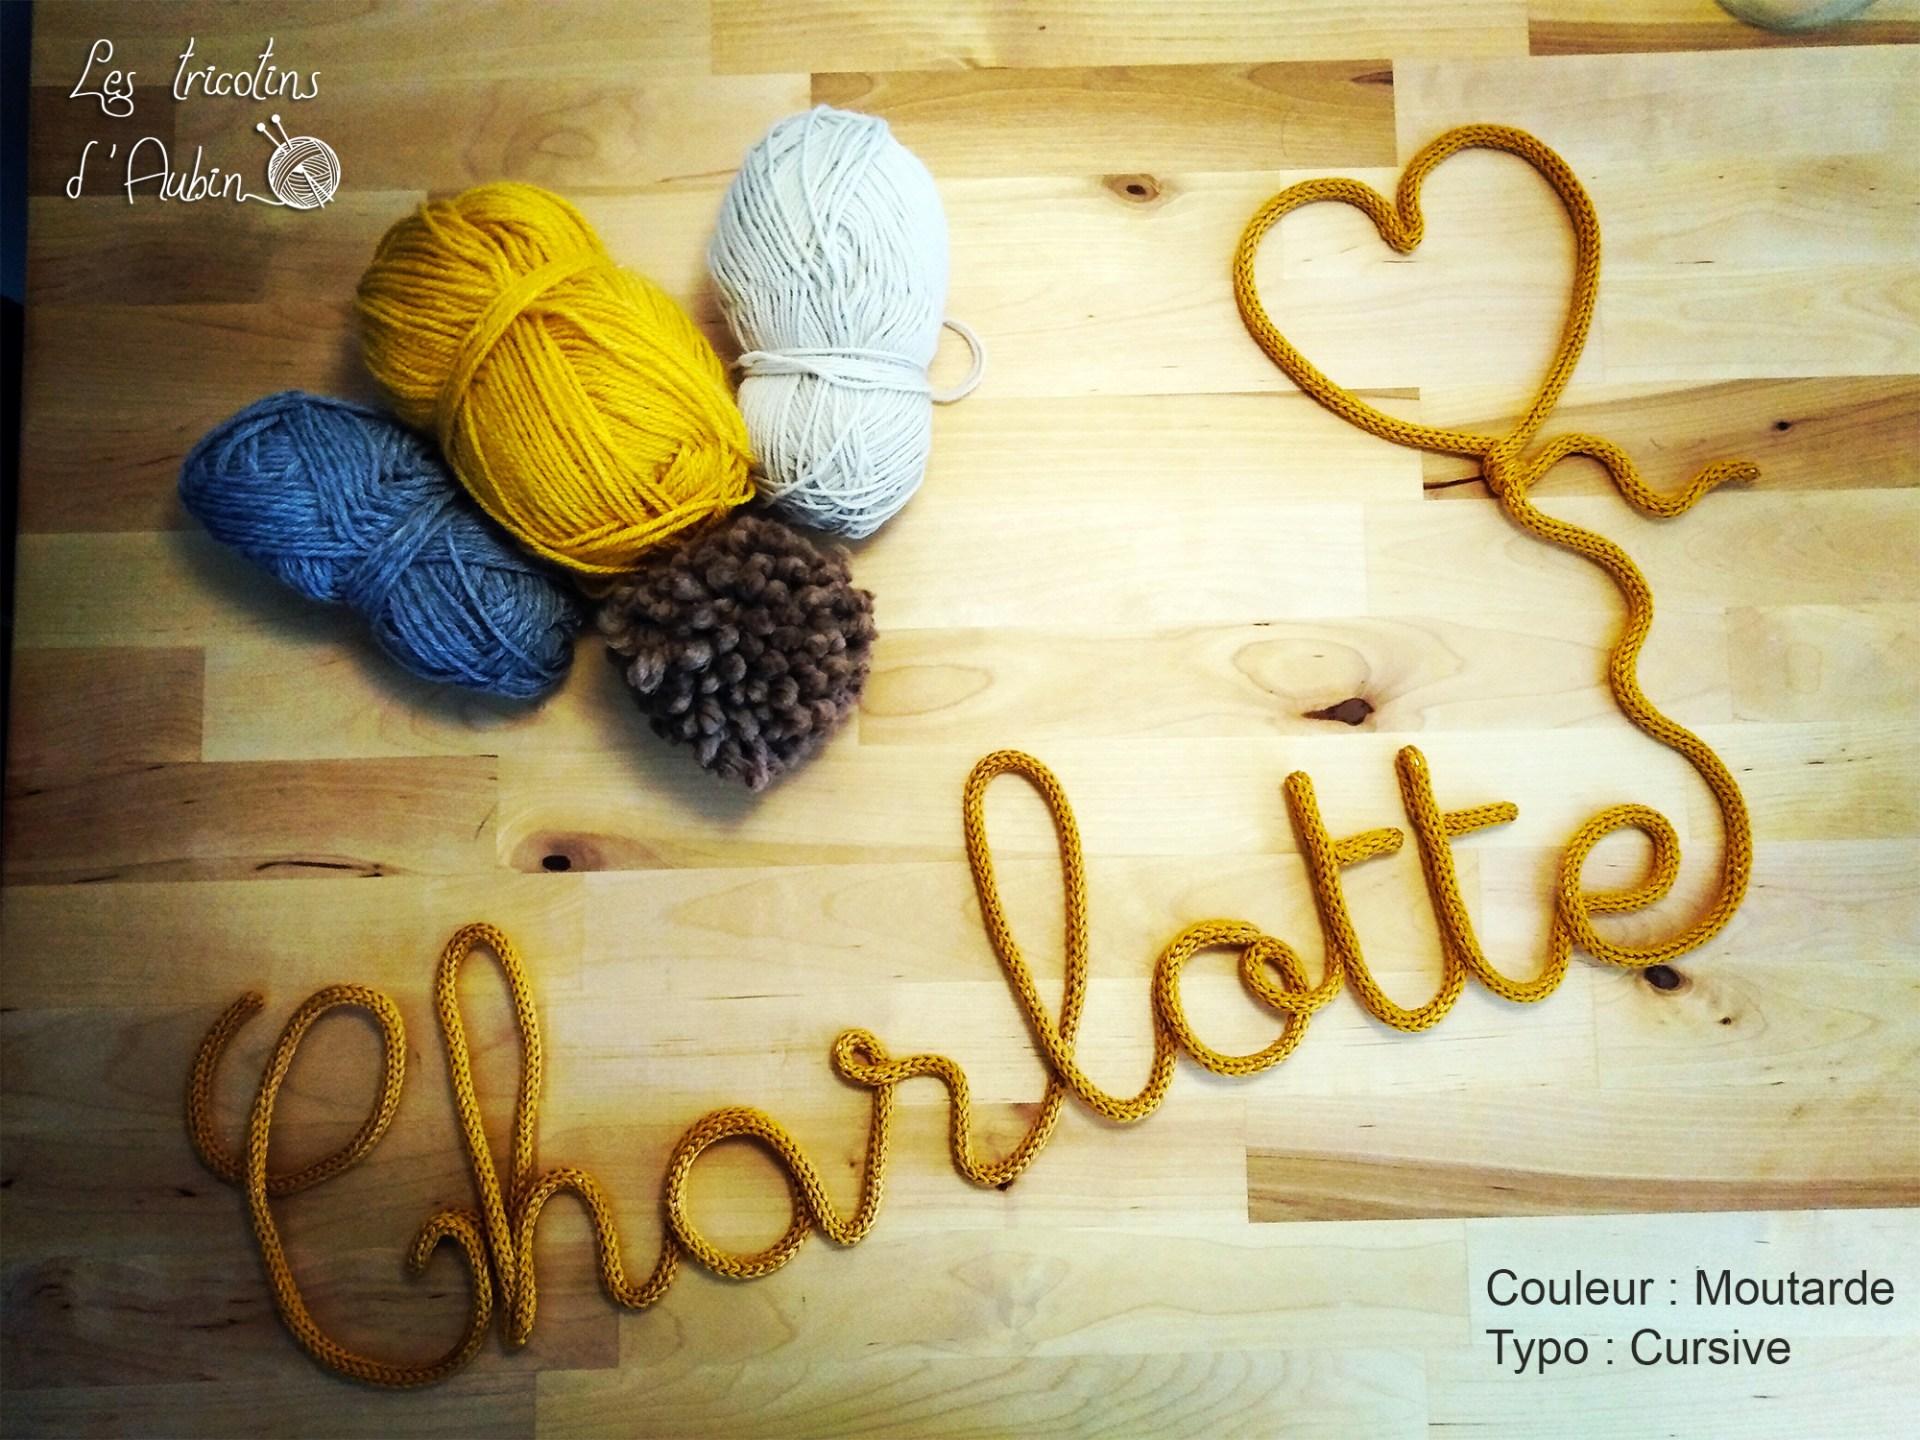 Charlotte tricotin